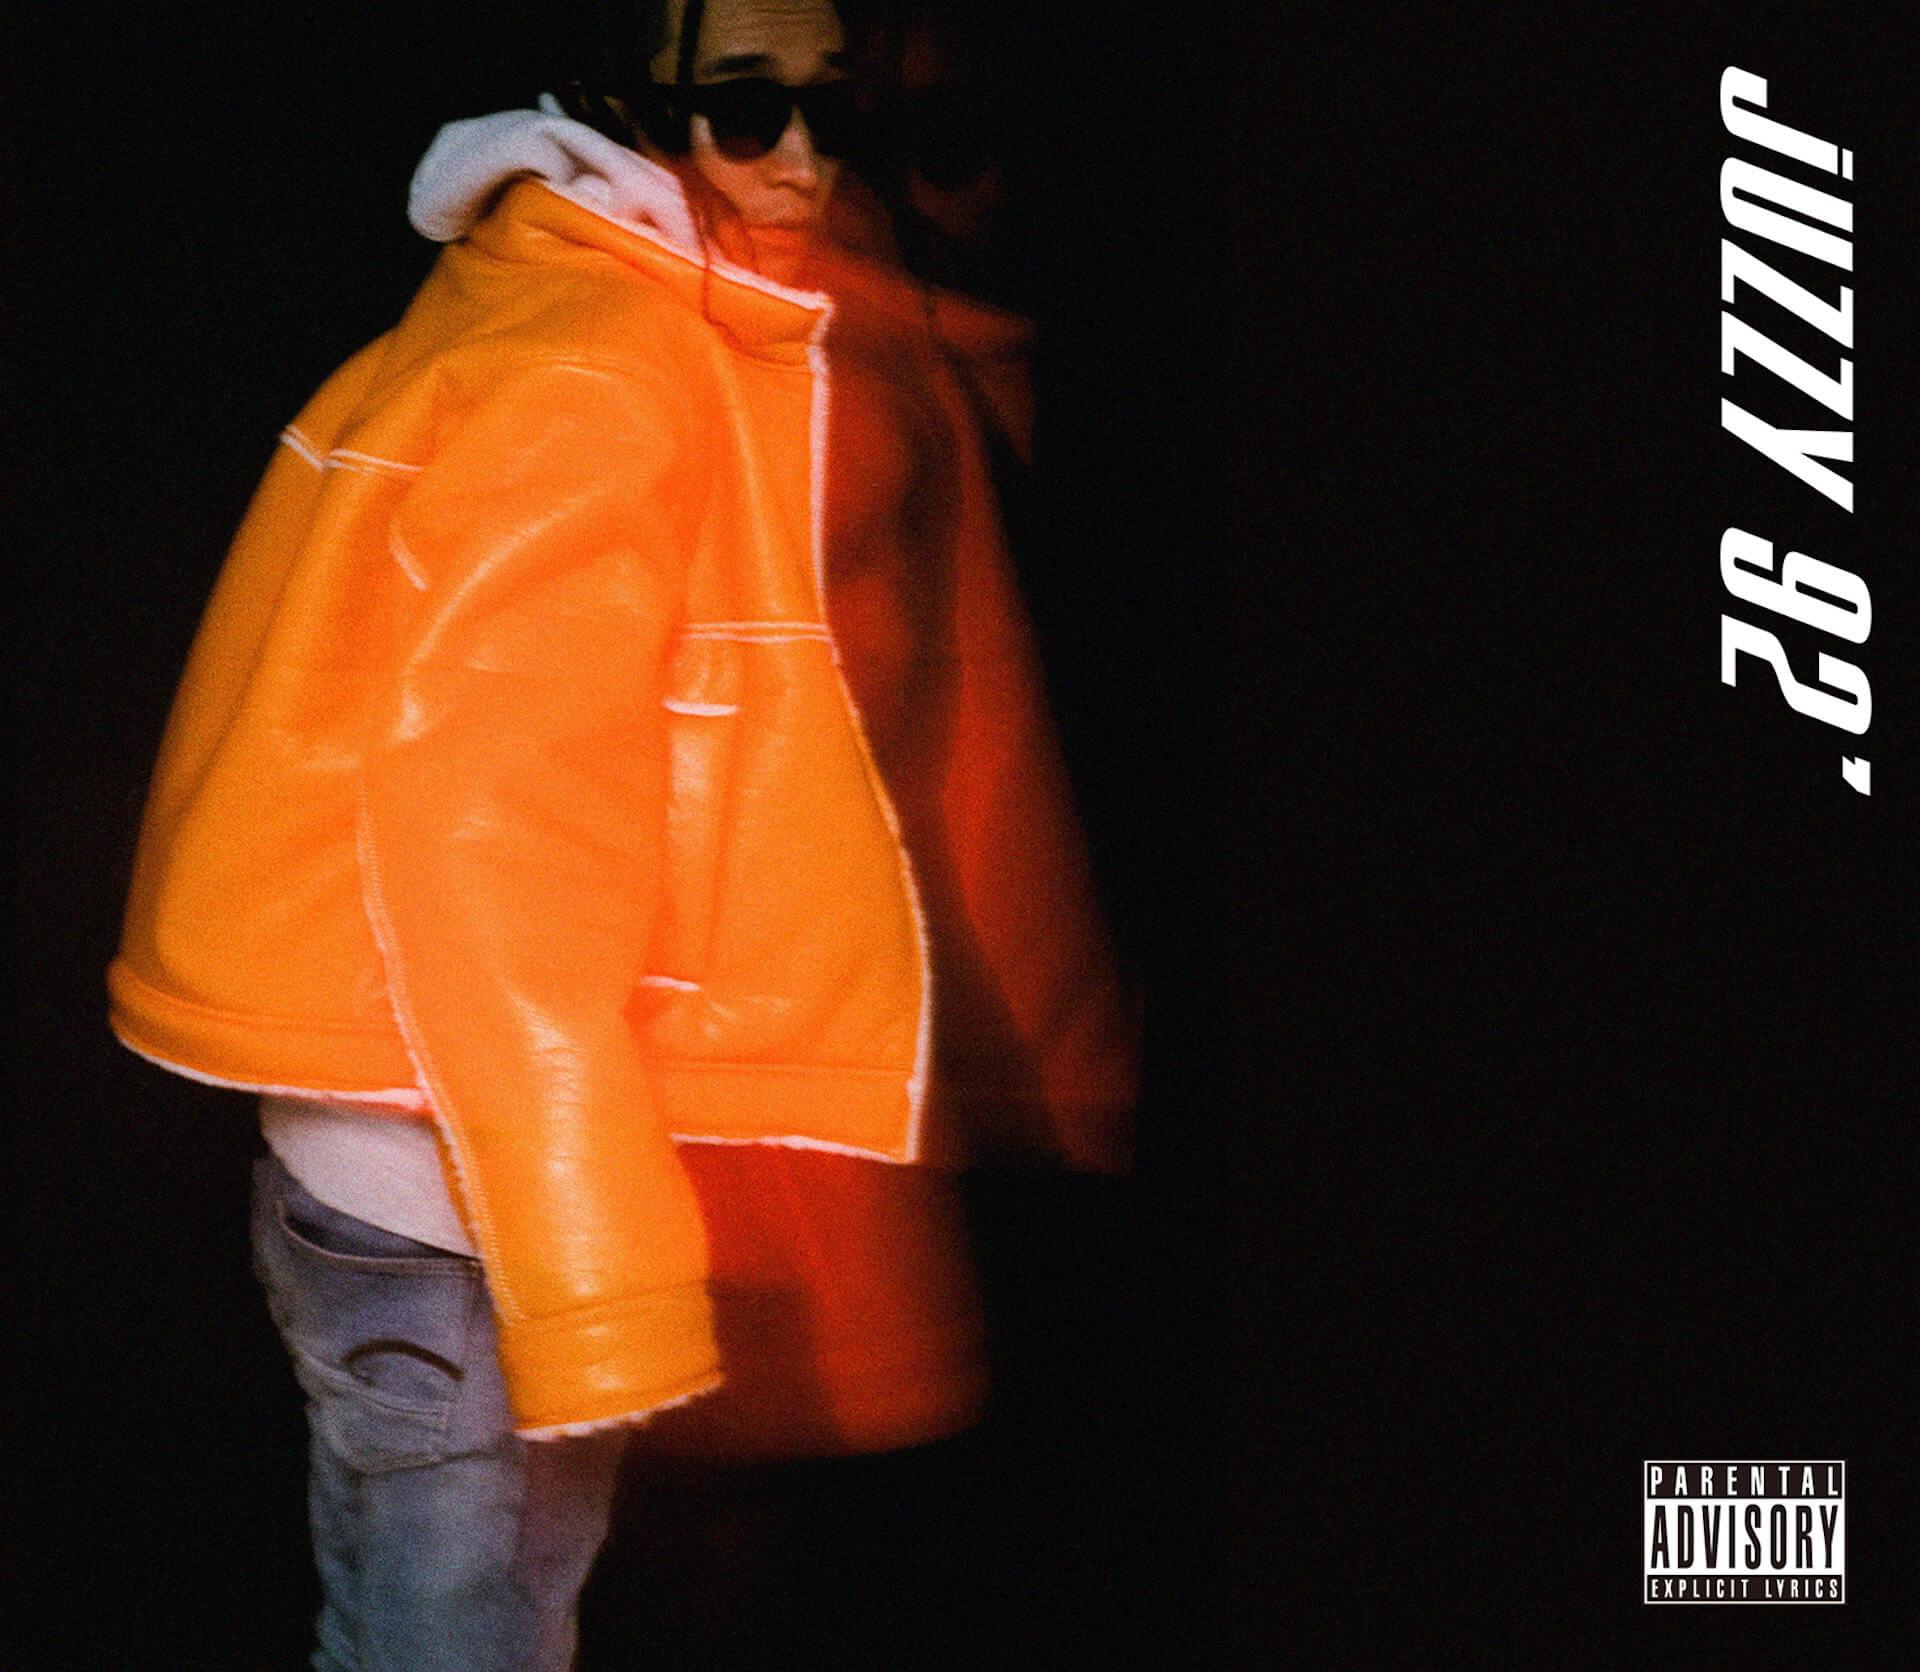 KEIJUがYOUNG JUJU時代の1stソロアルバム『juzzy 92'』を完全限定プレスでアナログ化! music210922_keiju_youngjuju_2